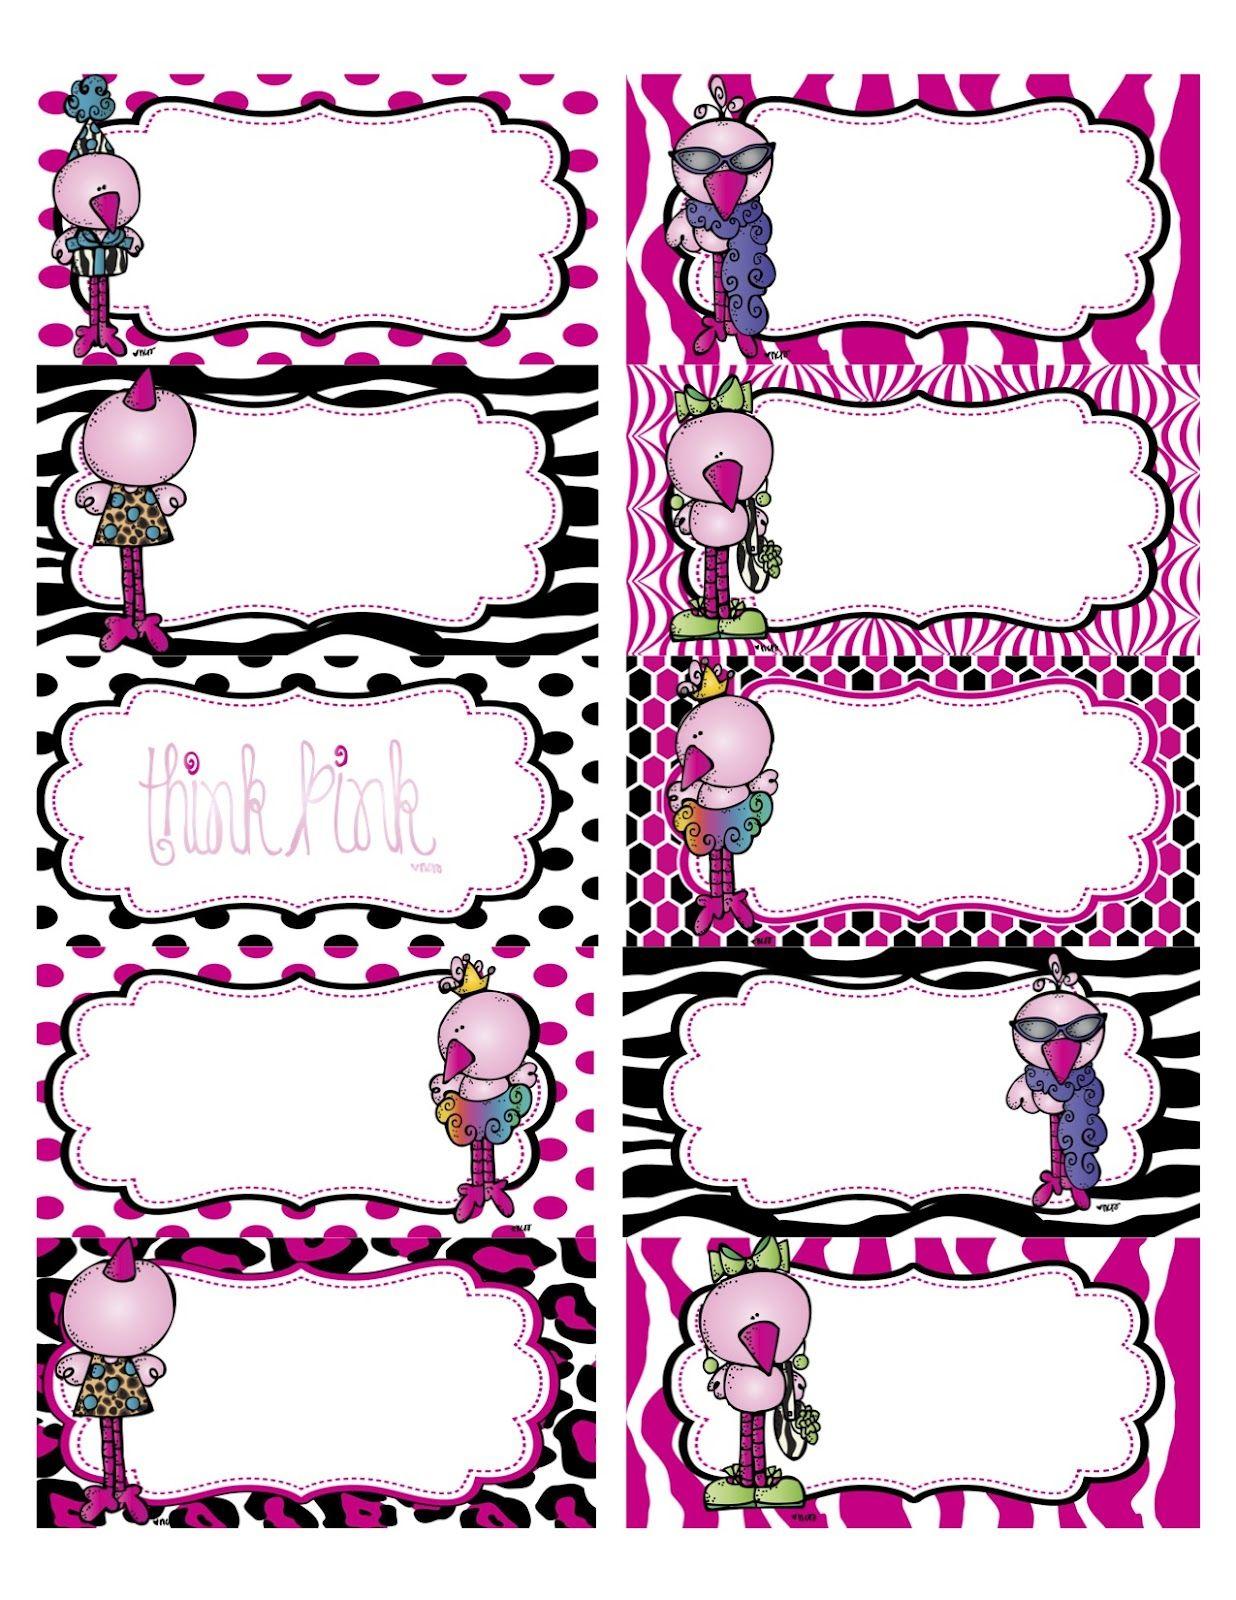 Flamingo+Labels.jpg (1236×1600) | กรอบข้อความ | Pinterest